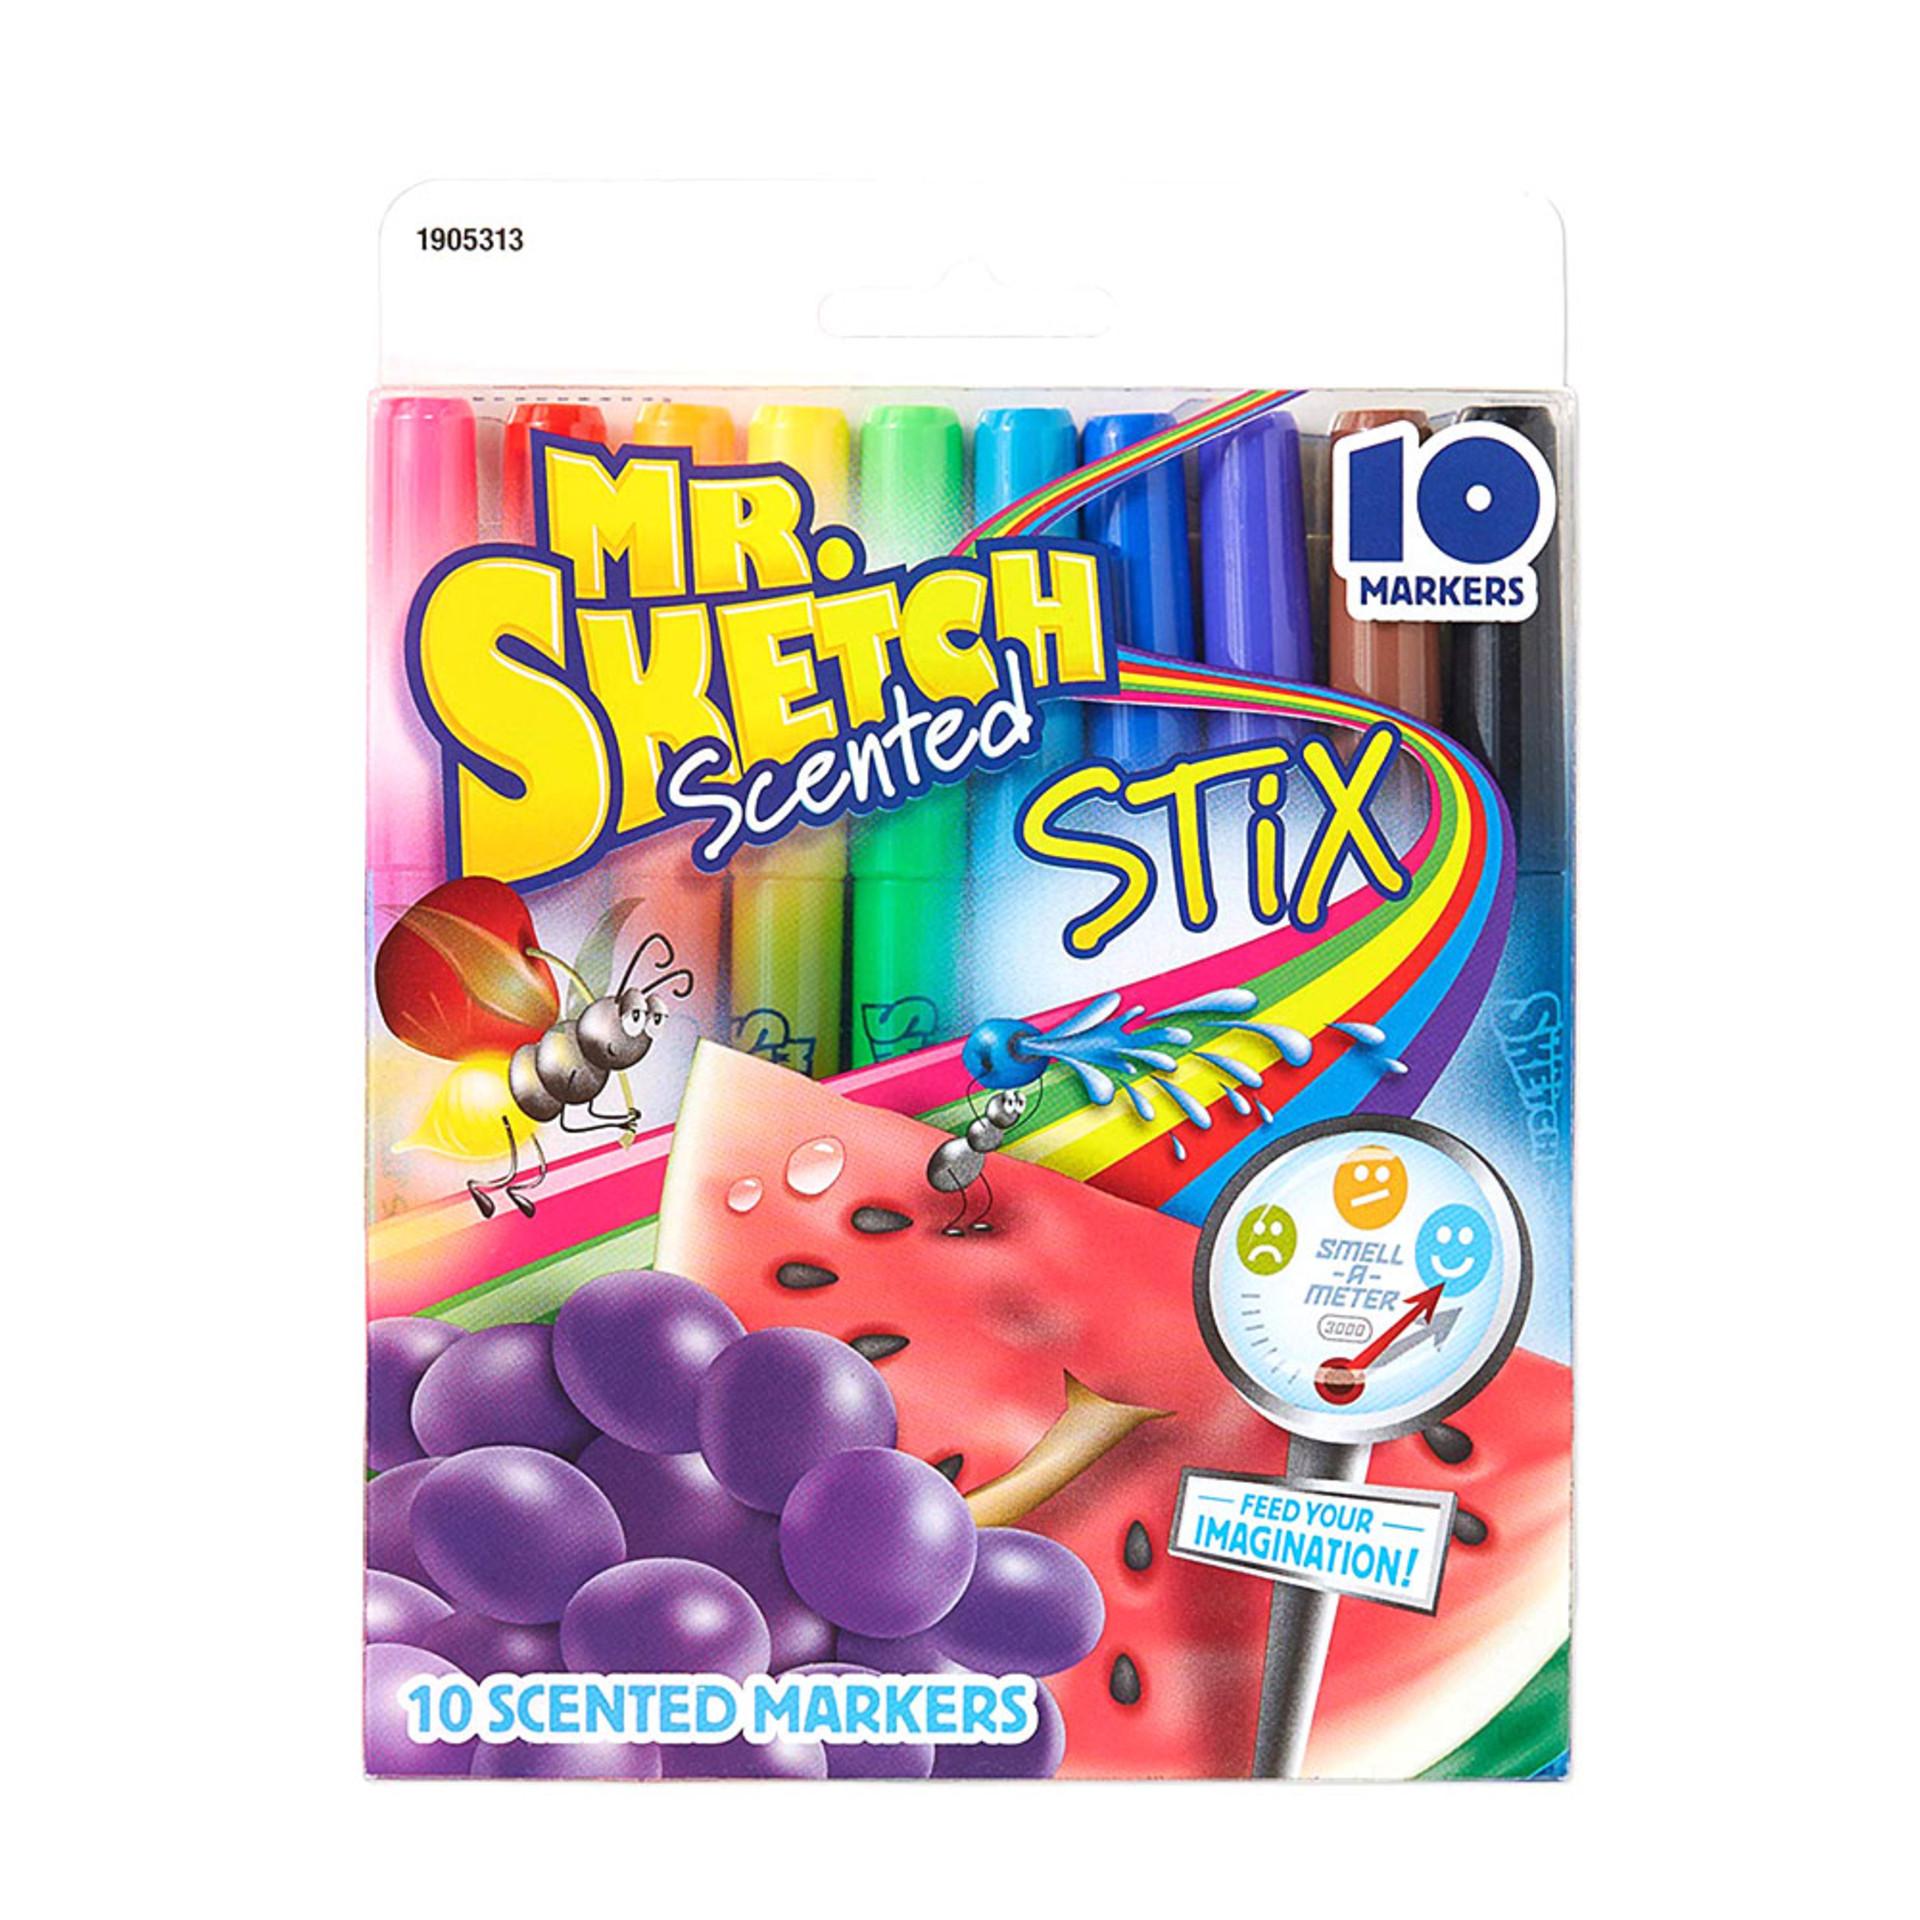 Mr. Sketch Scented Stix Watercolor Marker Set 10 piece